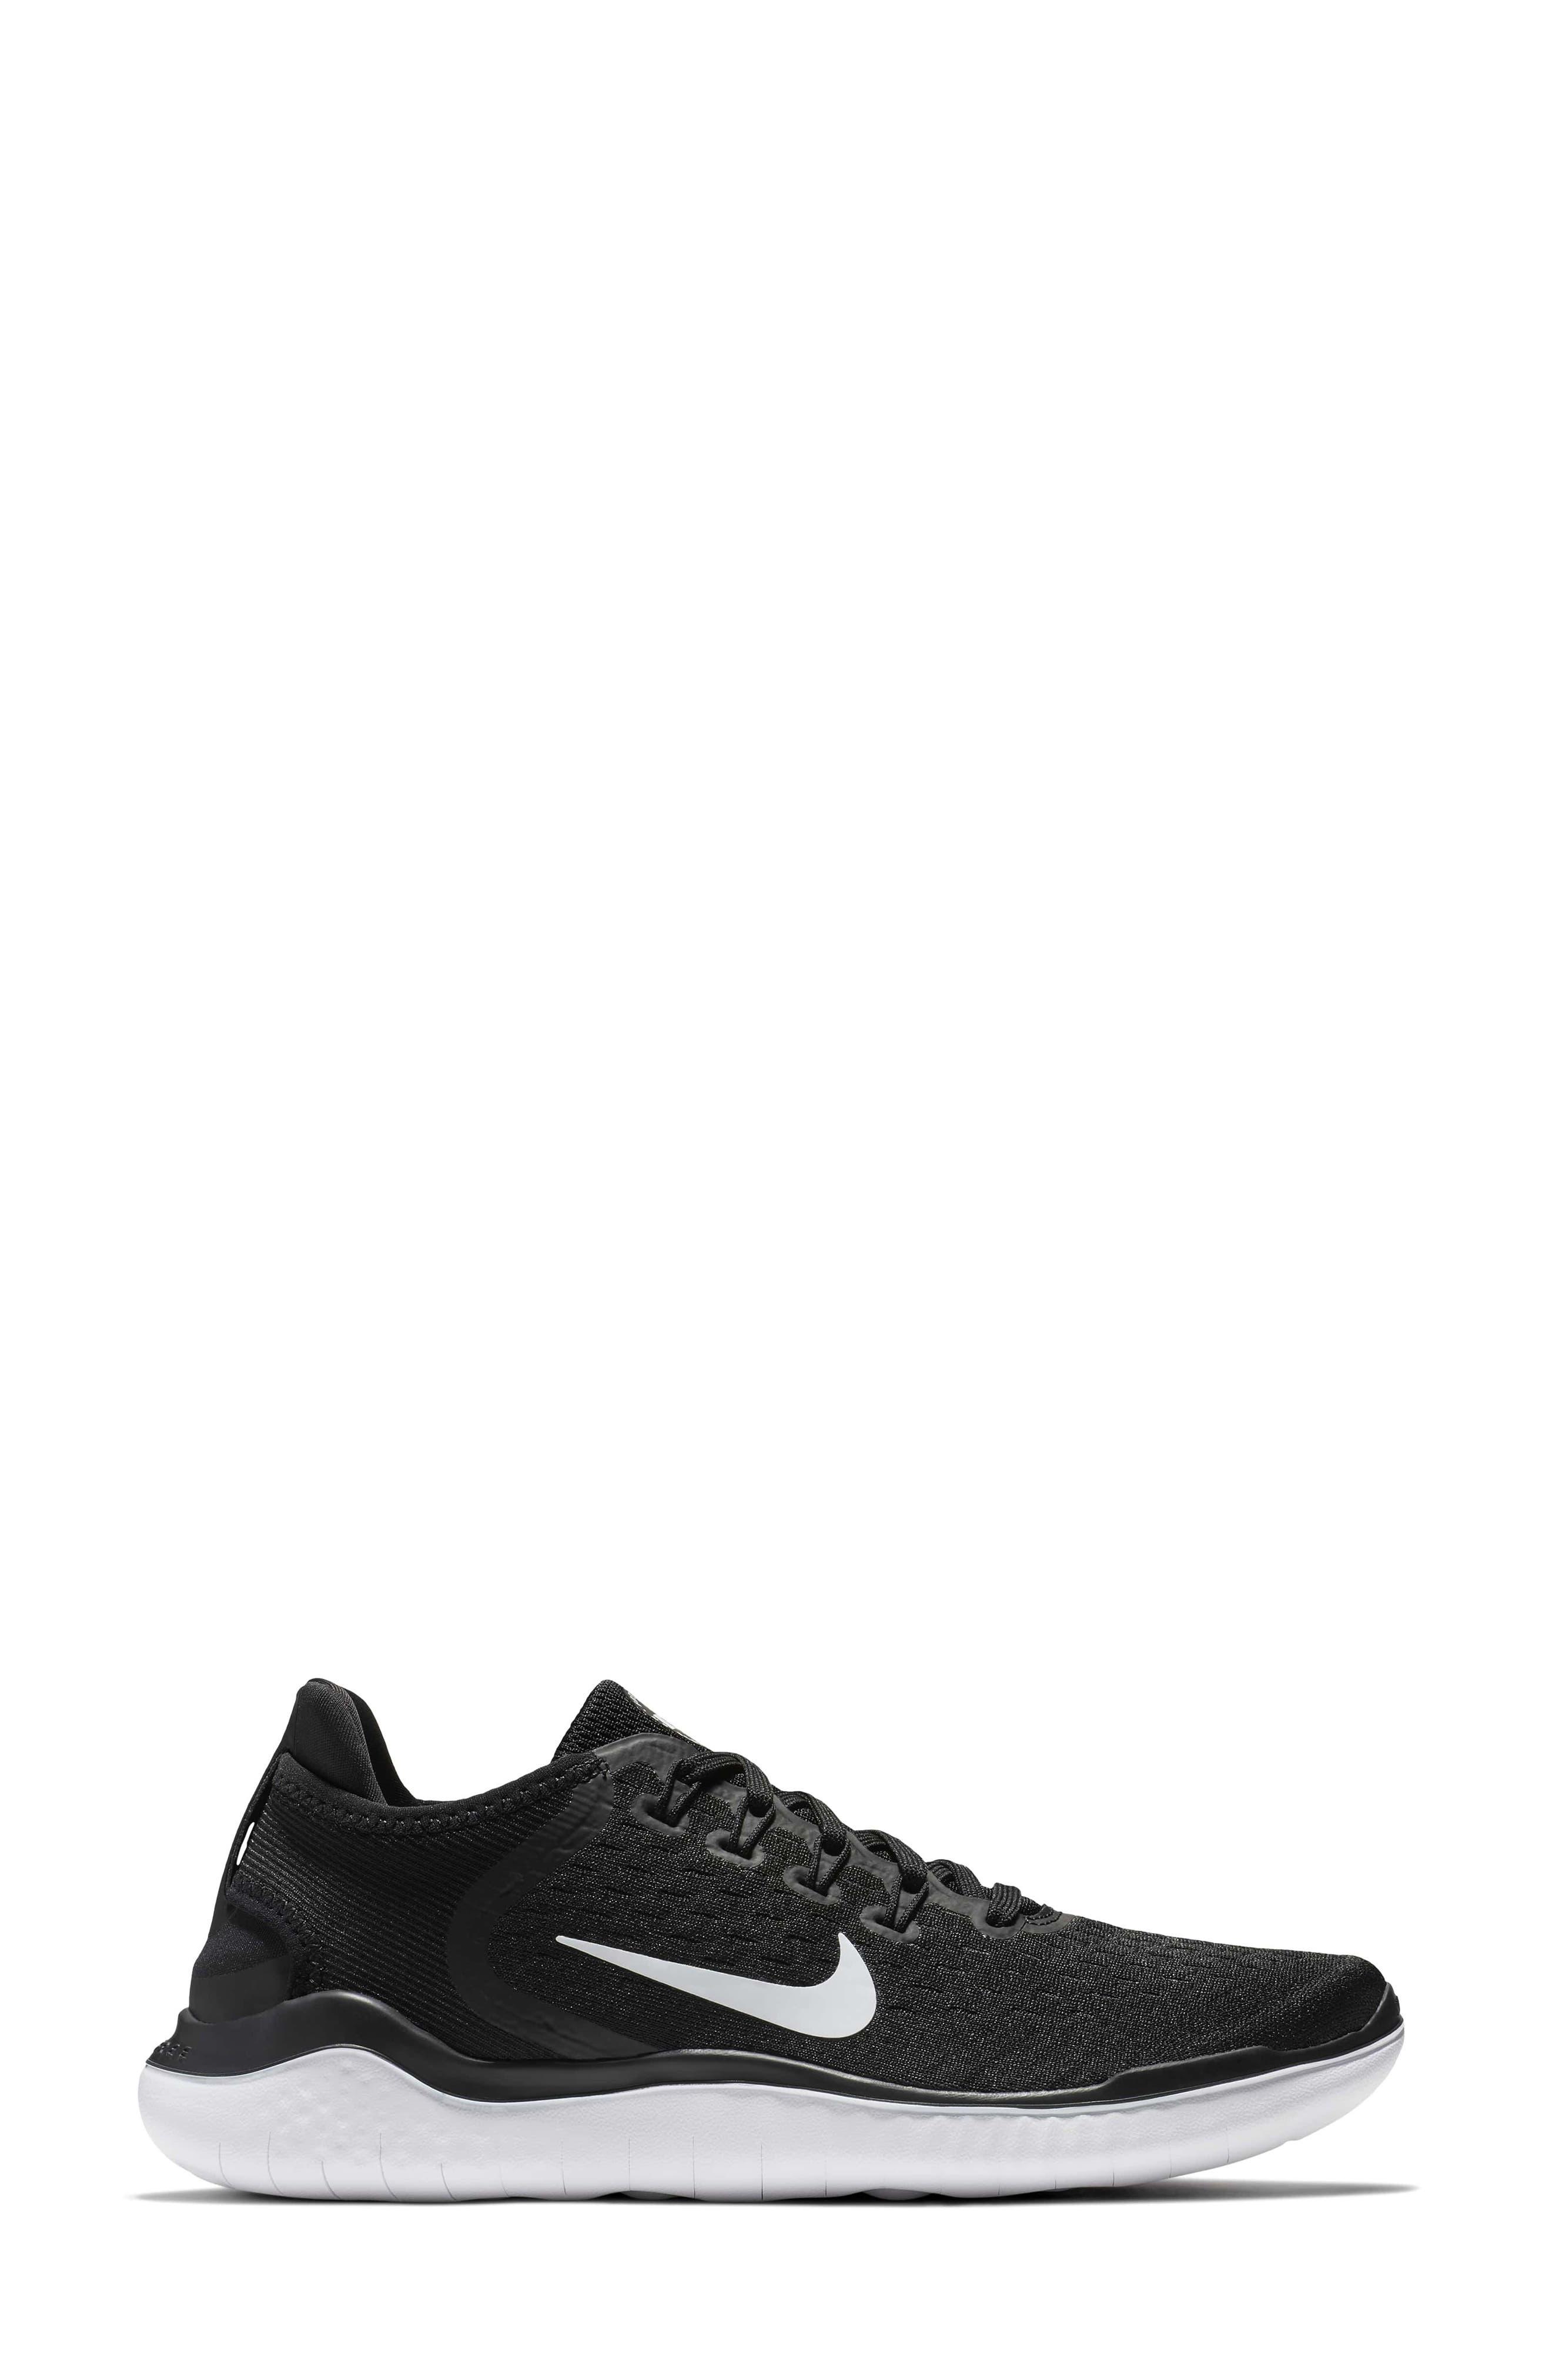 NIKE,                             Free RN 2018 Running Shoe,                             Alternate thumbnail 3, color,                             BLACK/ WHITE